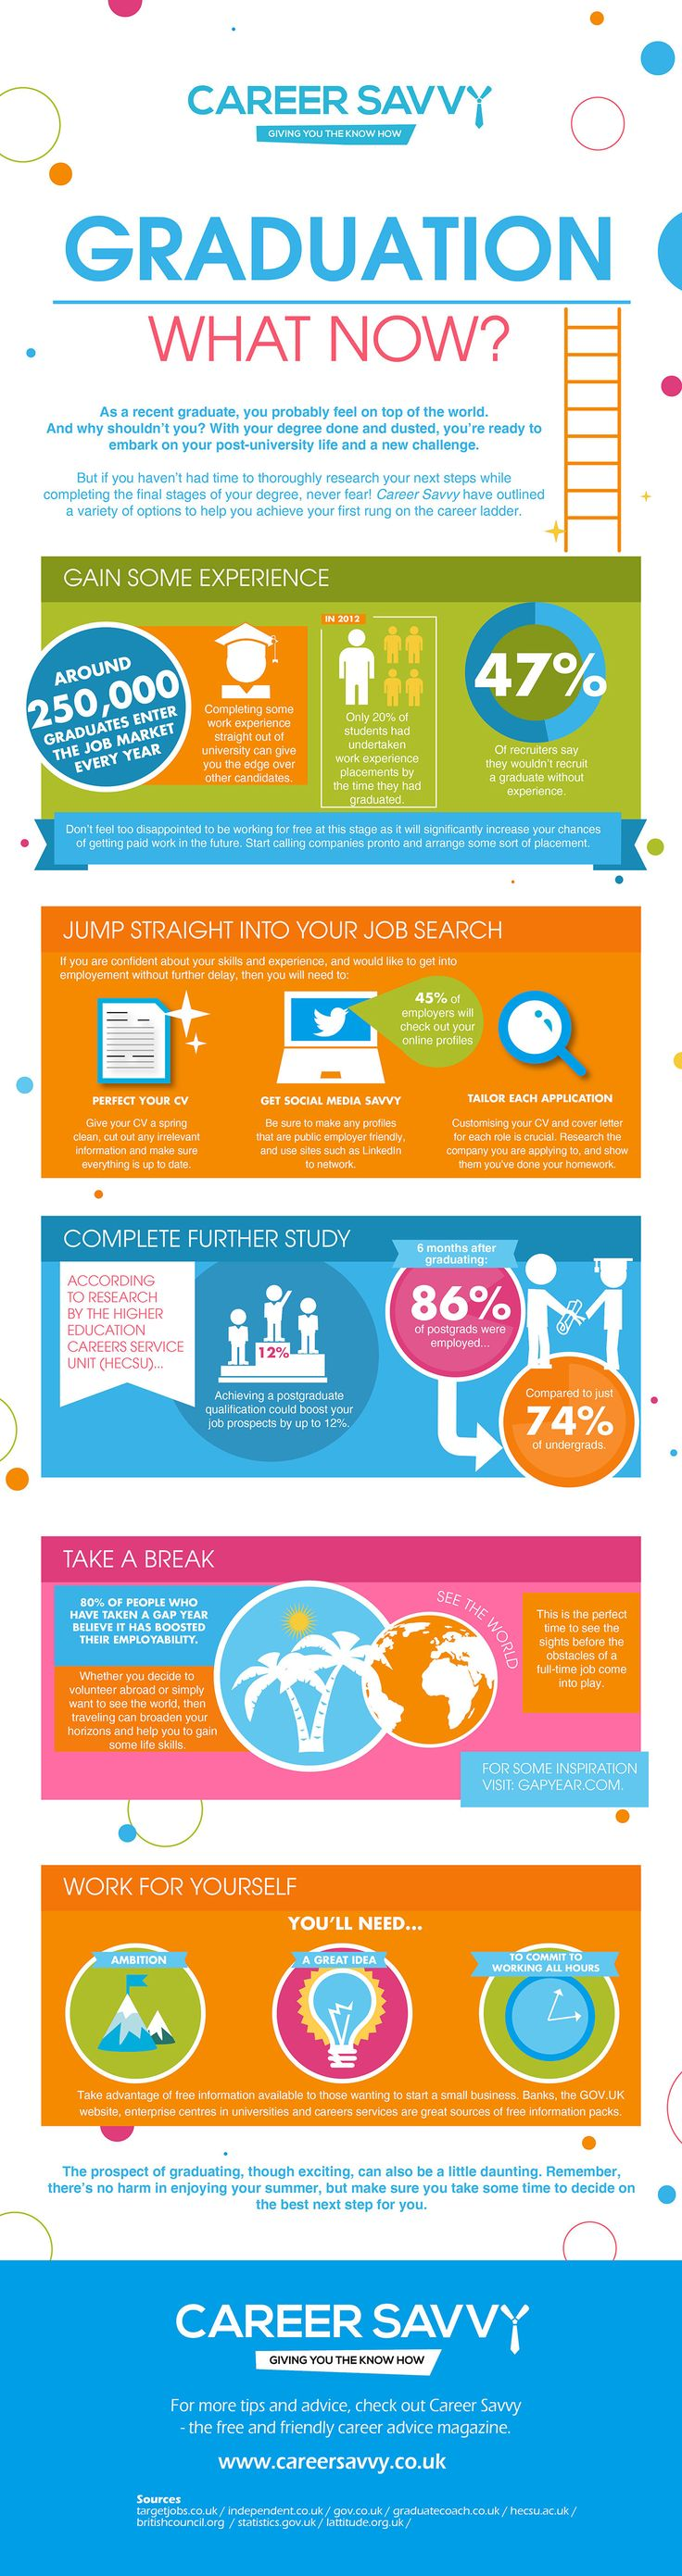 Graduation - What Now?   #infographic #Graduation #Career #jobs #Education